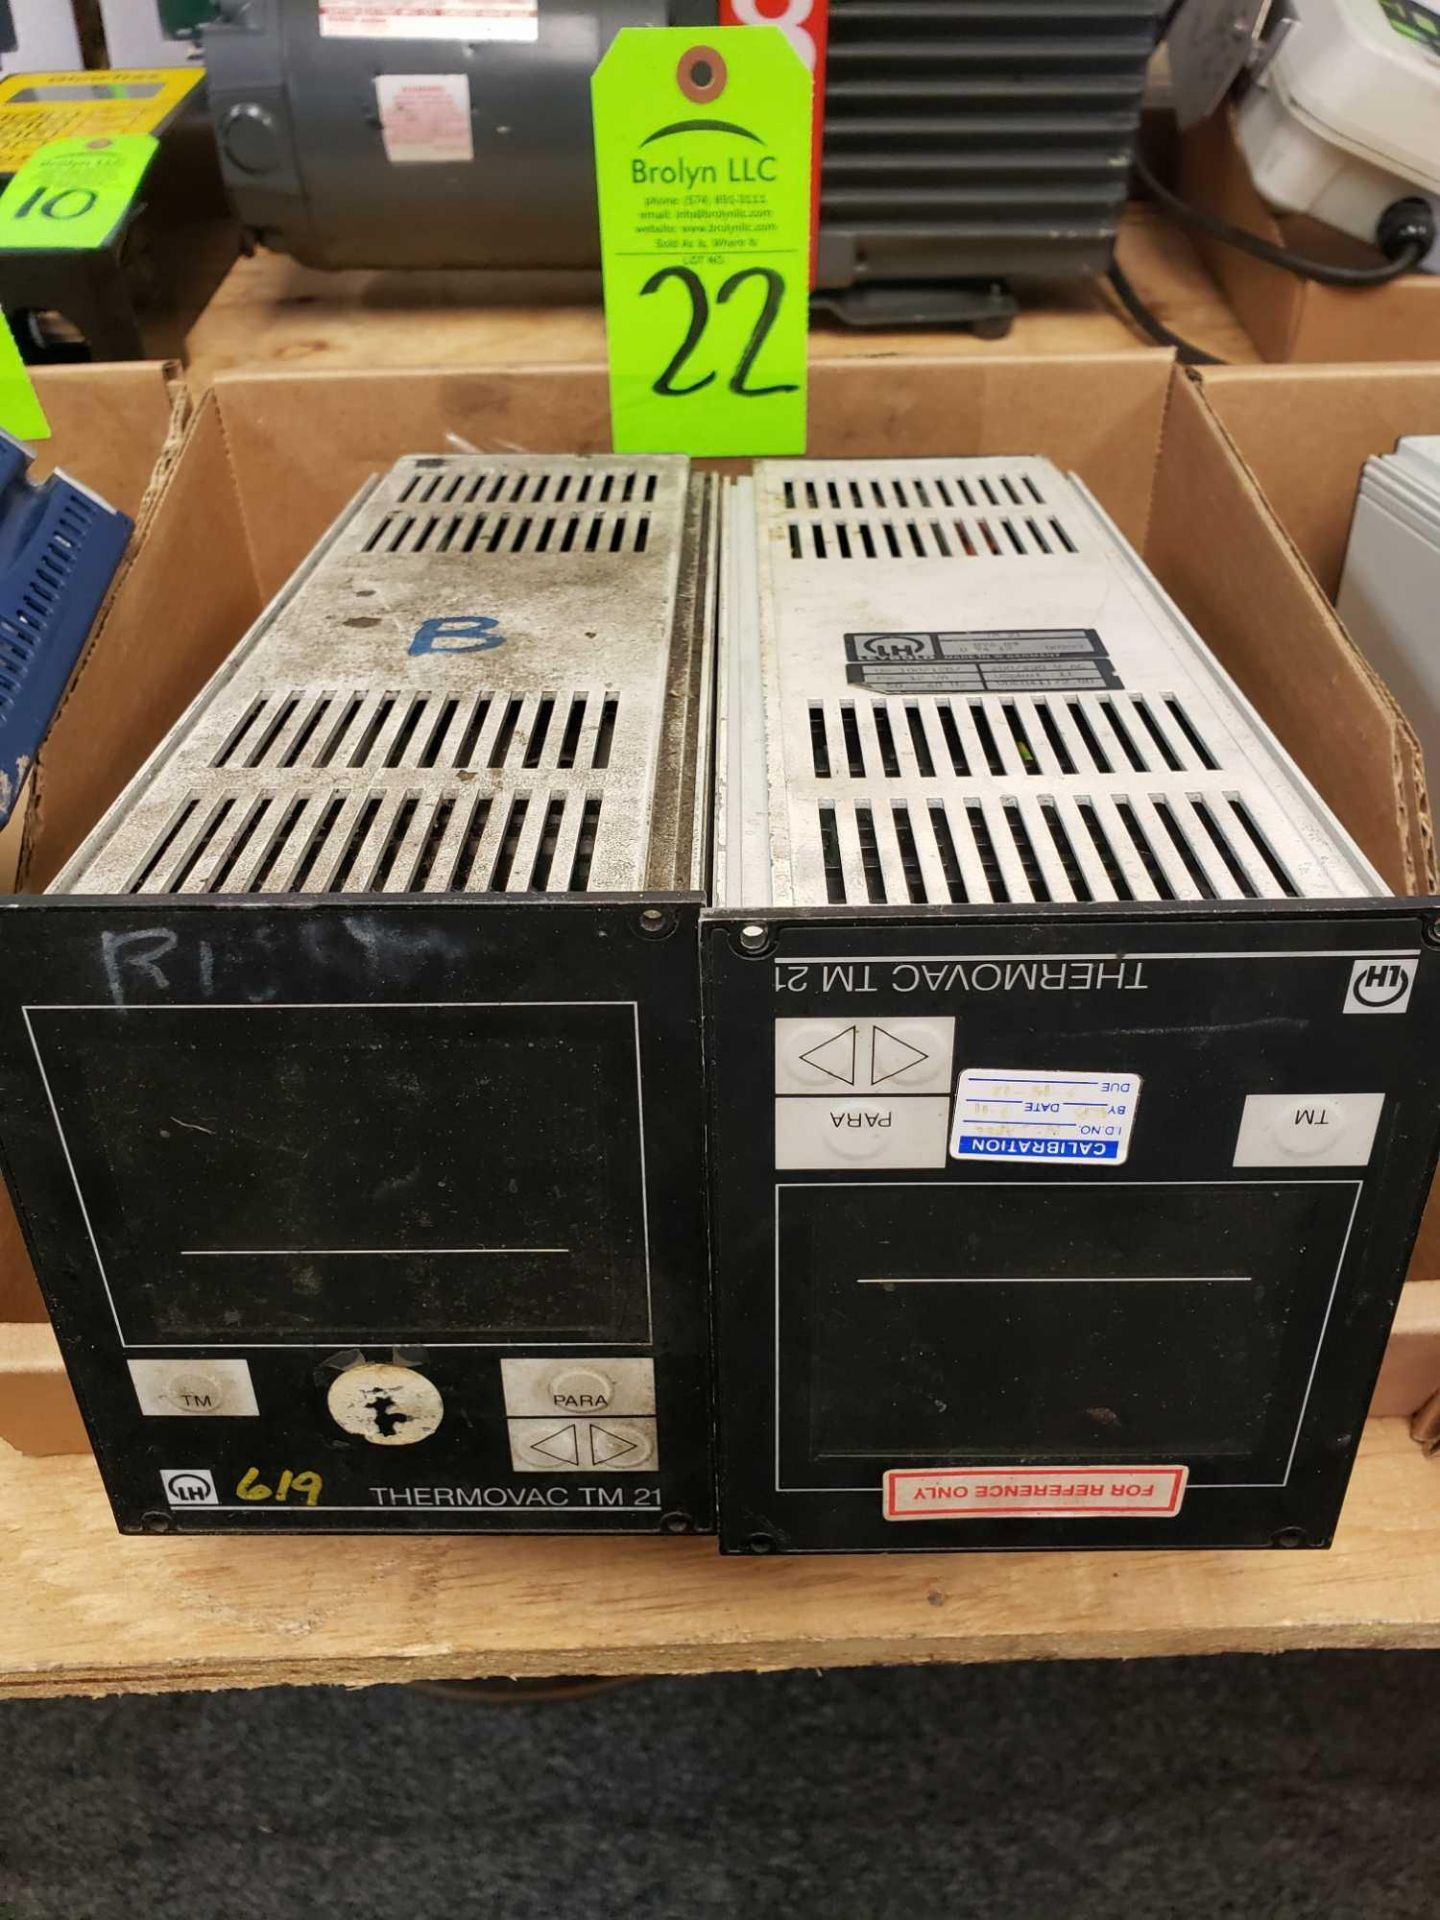 Lot 22 - Qty 2 - ThermoVac TM21 vacuum controller units